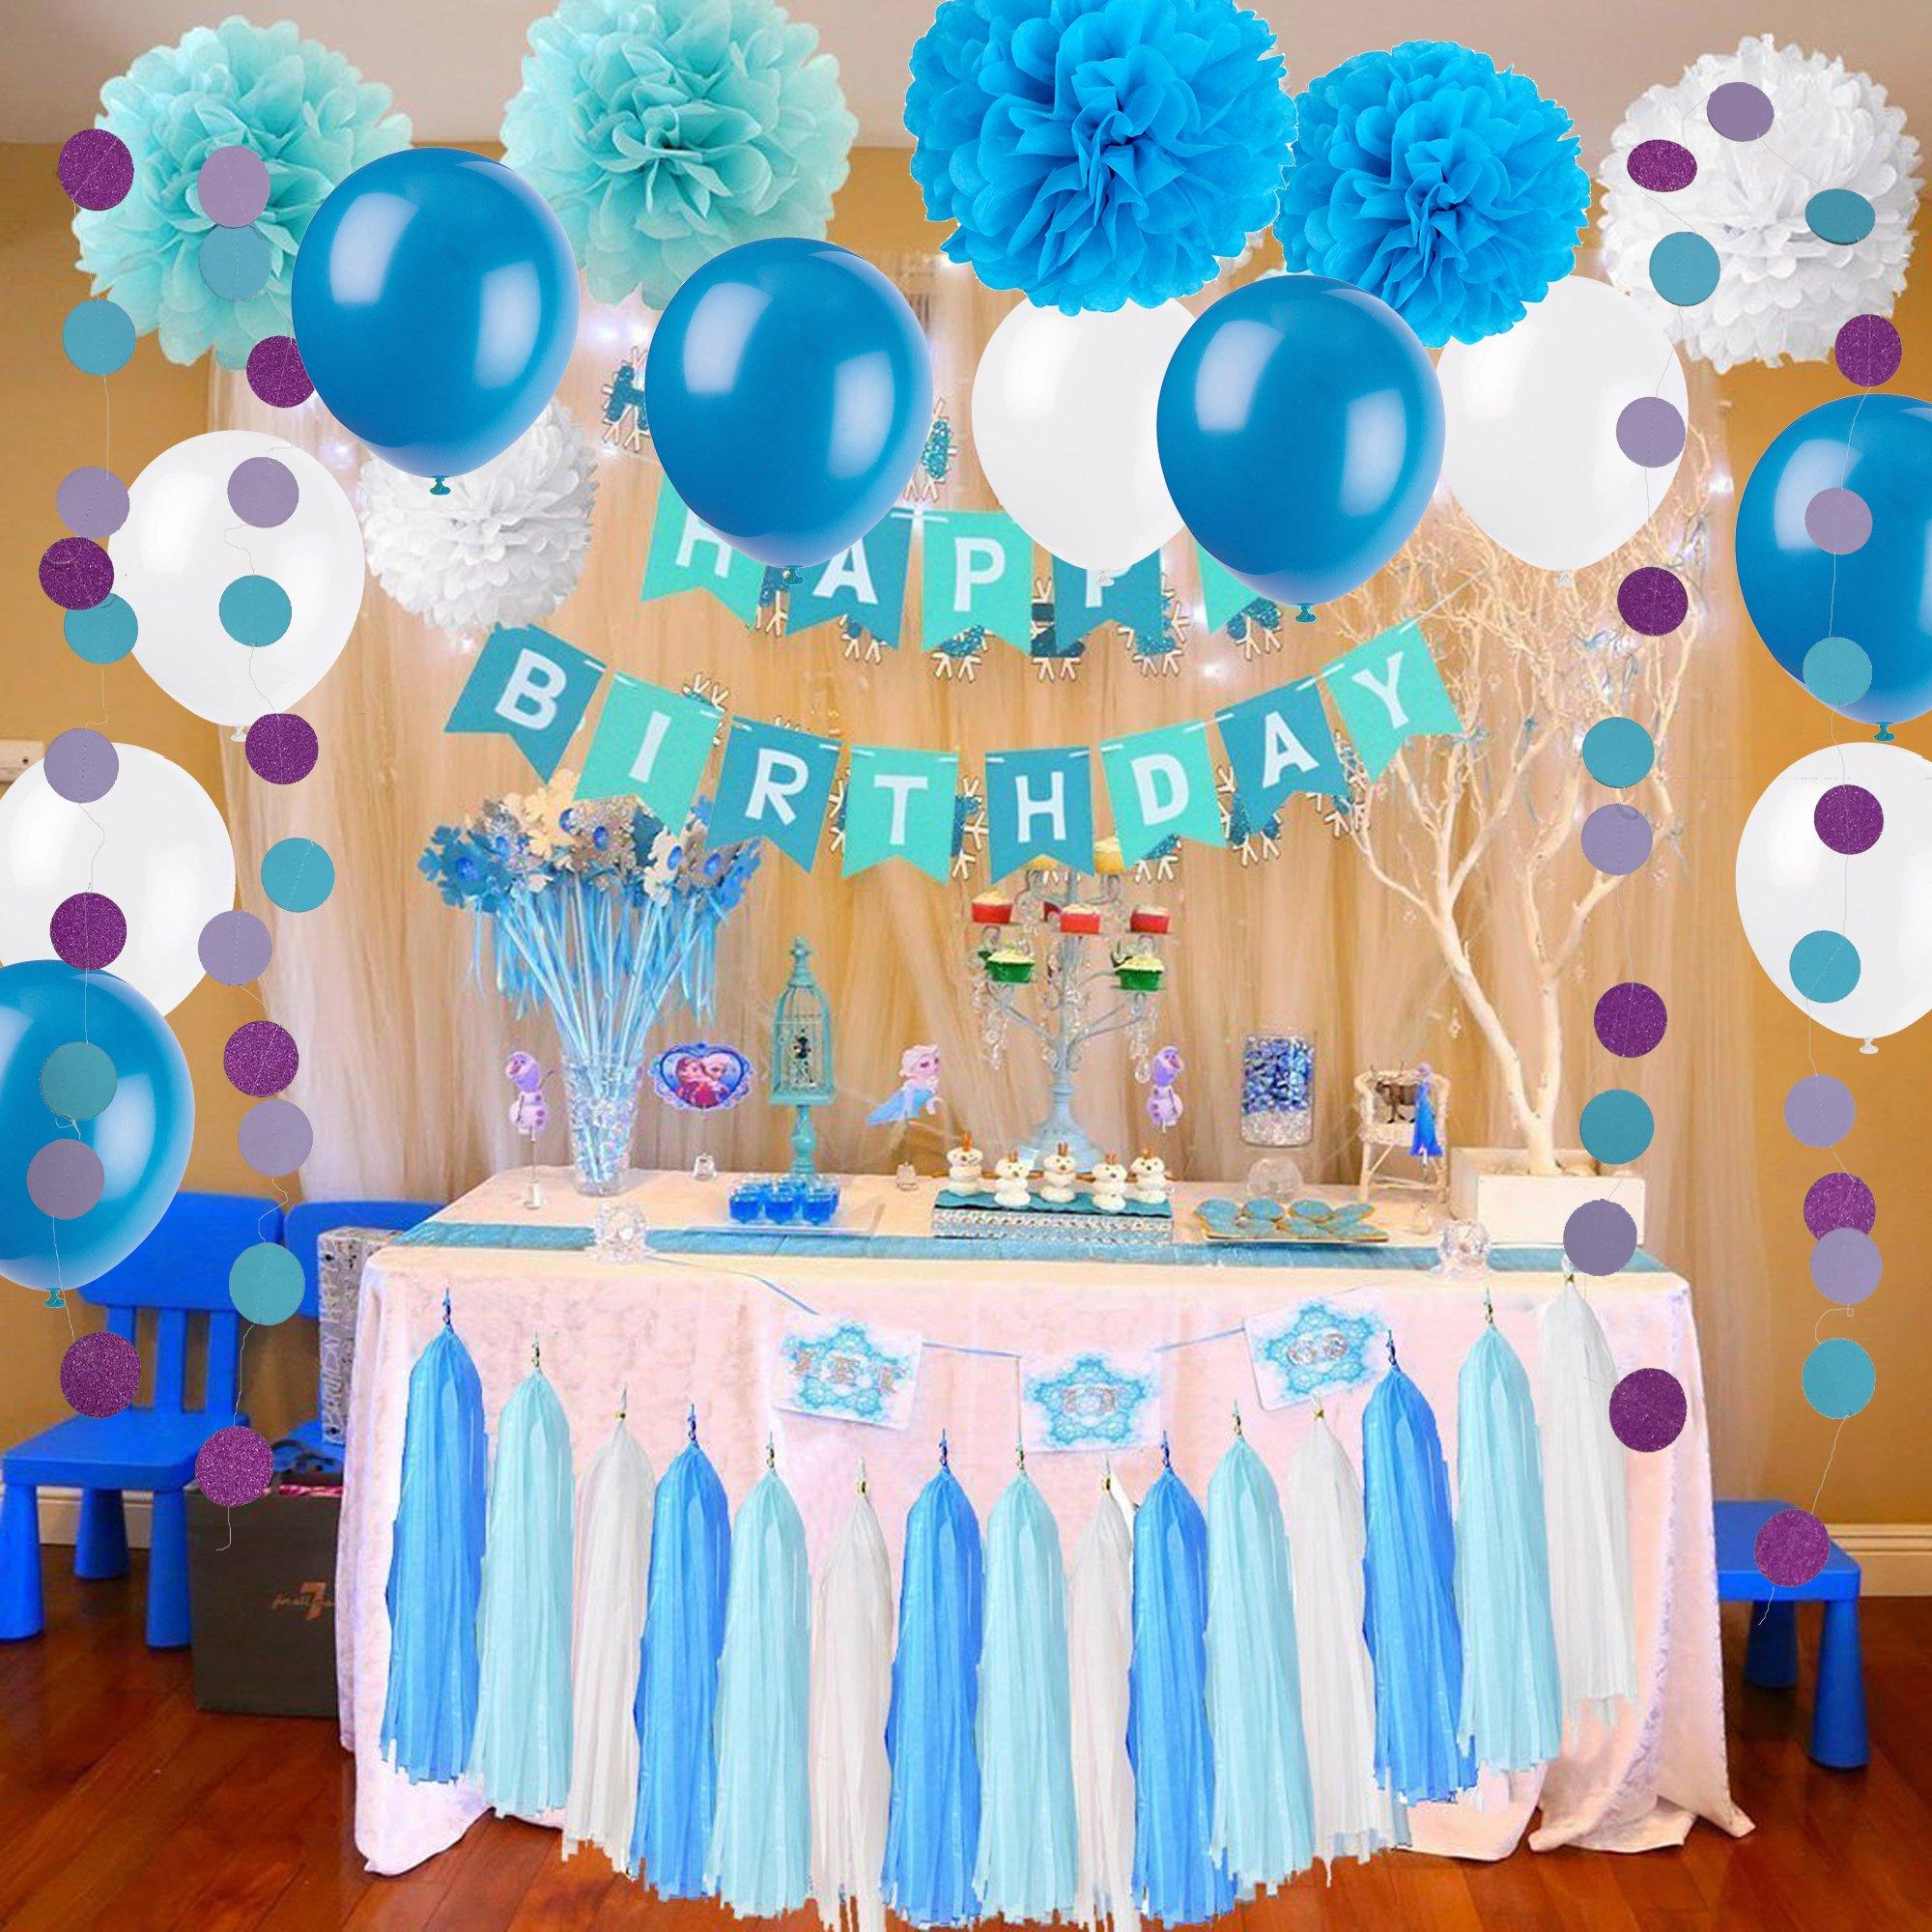 Christening Blue Acid free 10 Sheet Tissue Paper Crafts Birthday wedding